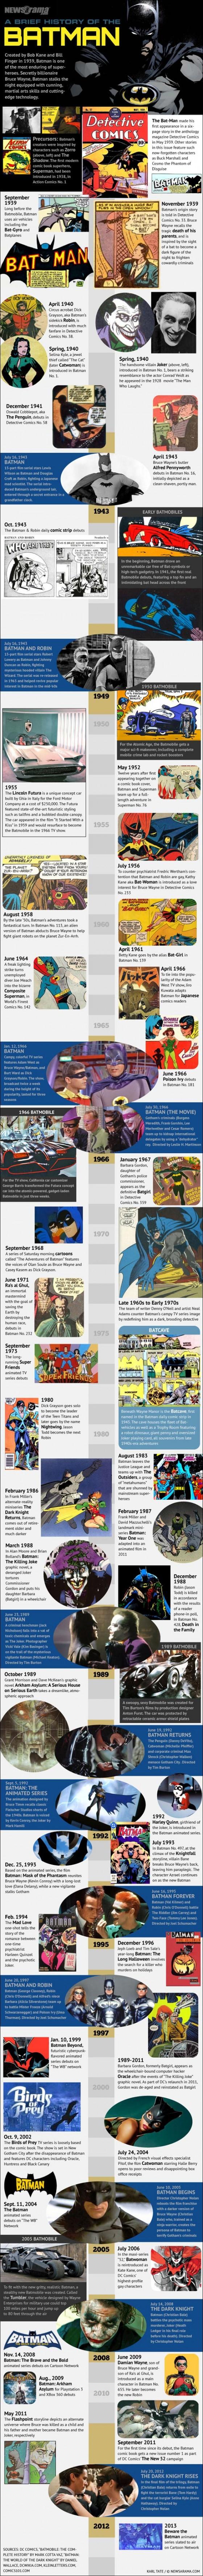 batman timeline 120720a 02 560x7097